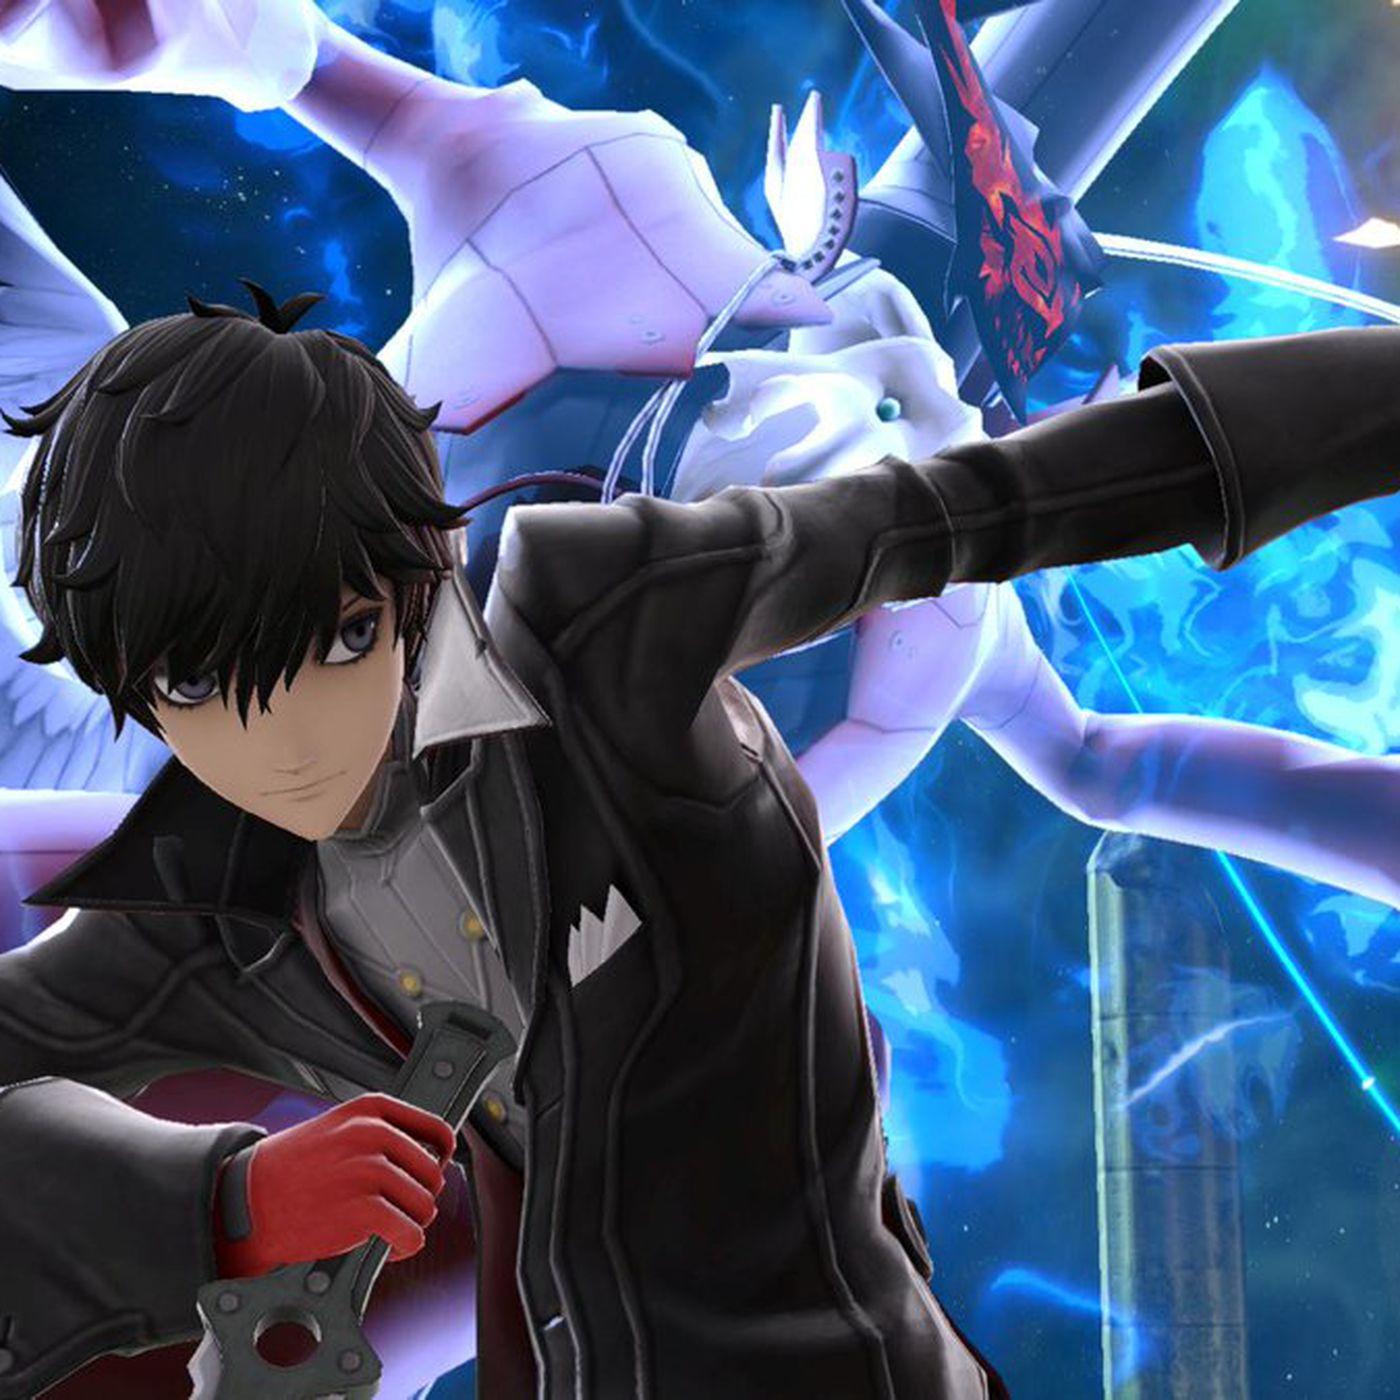 Super Smash Bros  Ultimate: Persona 5's Joker DLC coming